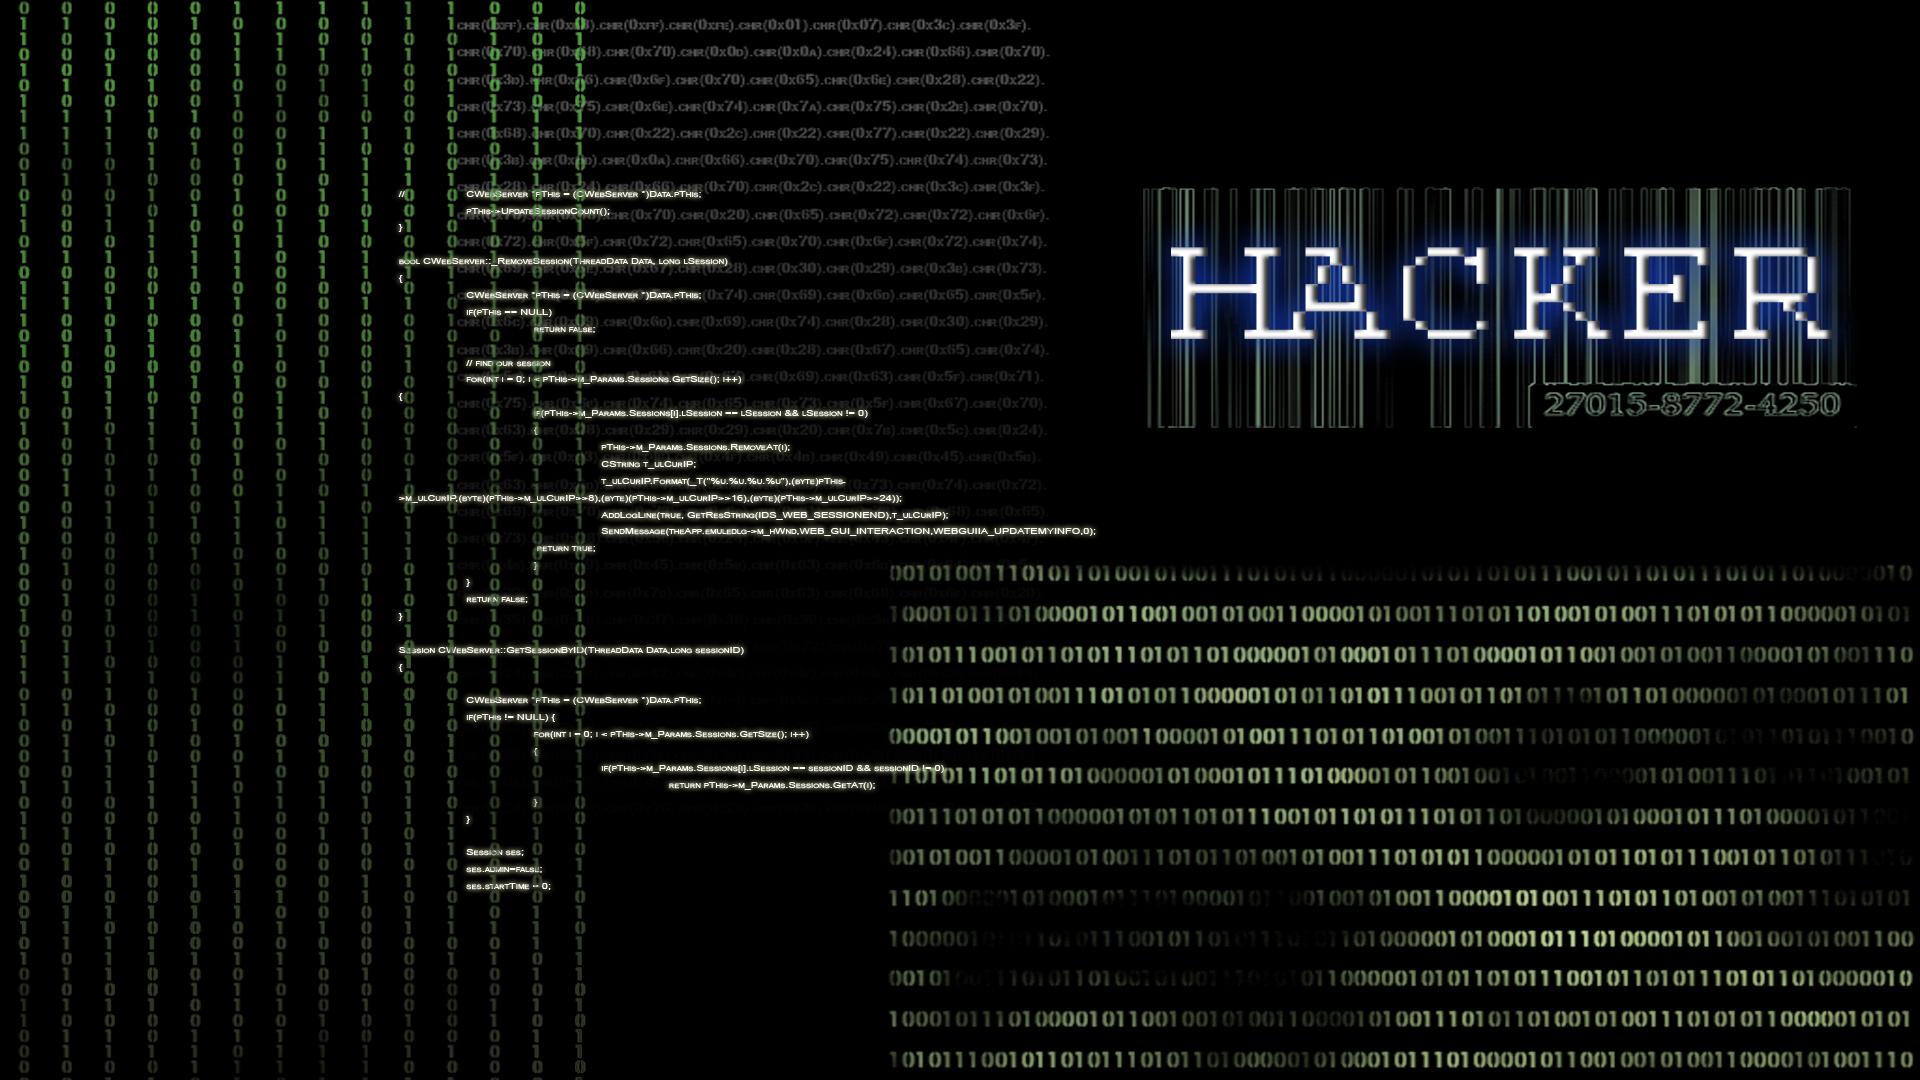 hacker wallpaper 1920x1080 - photo #15